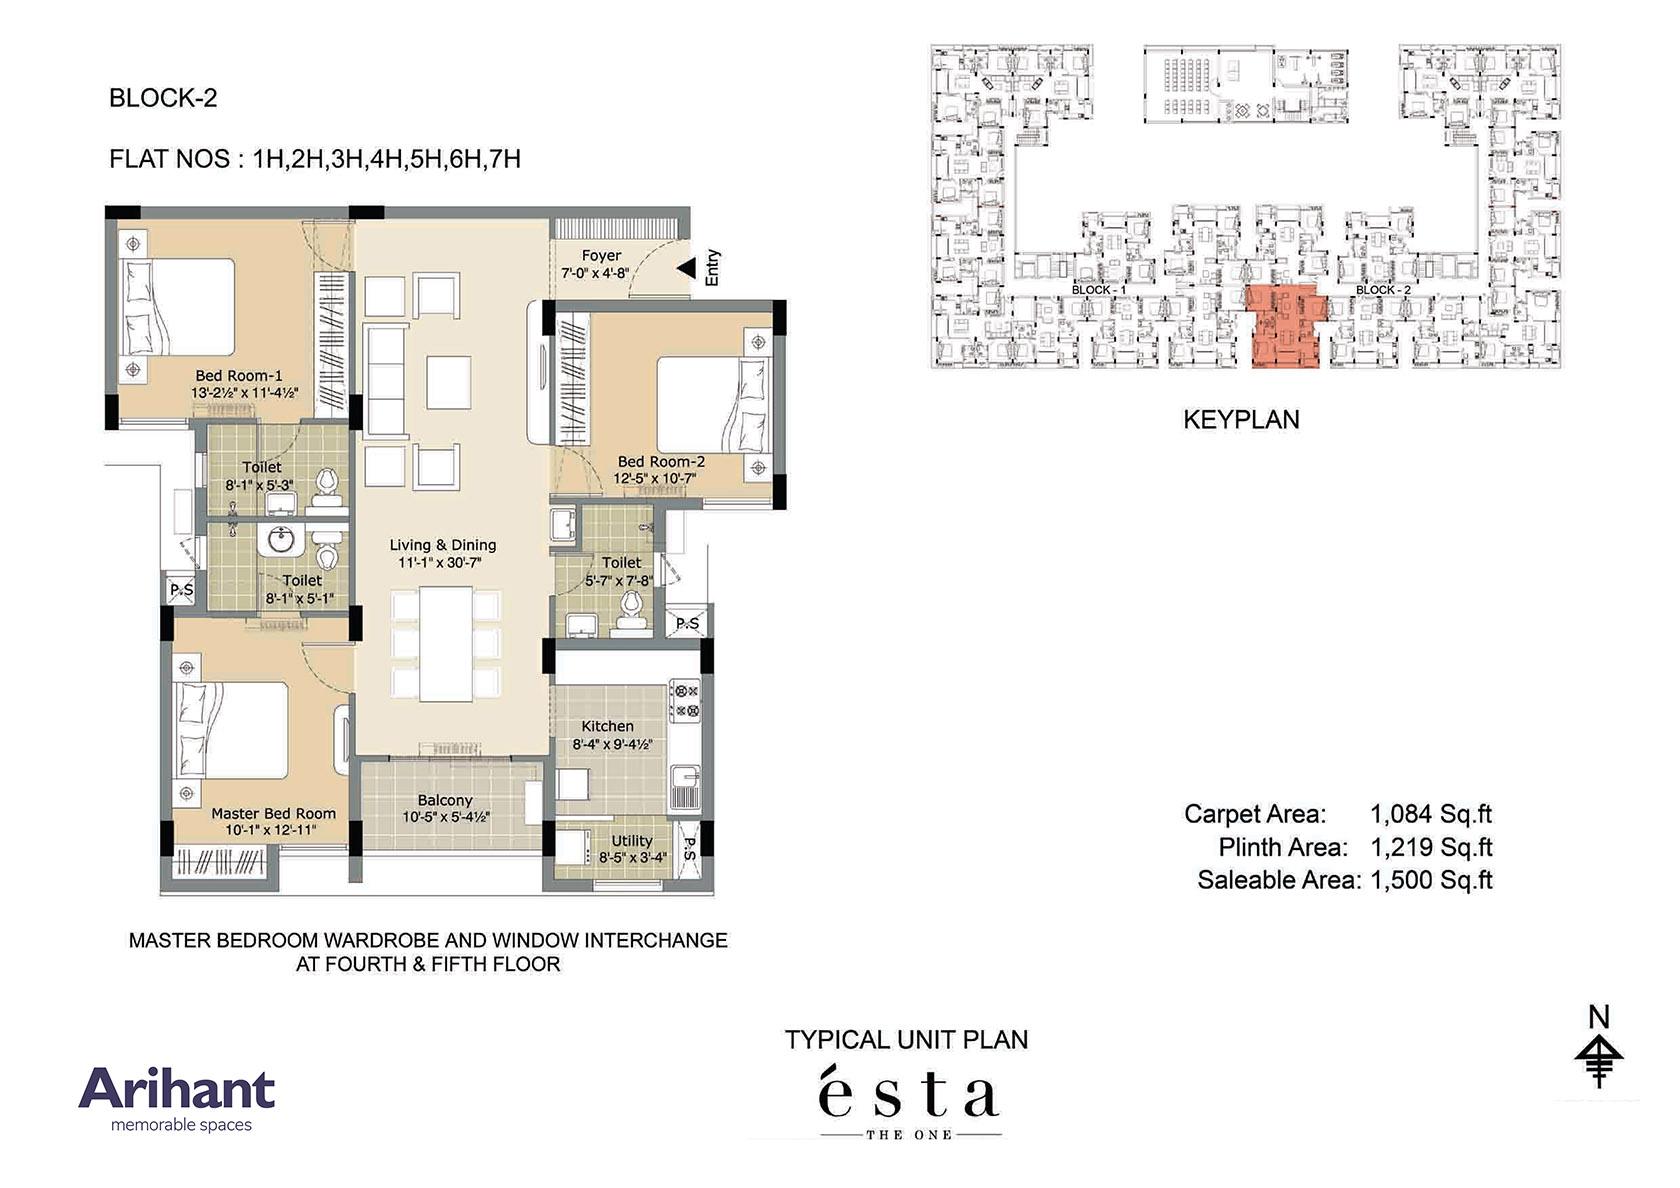 Arihant - Esta_Typical Unit Plan - Block 2 - Type H